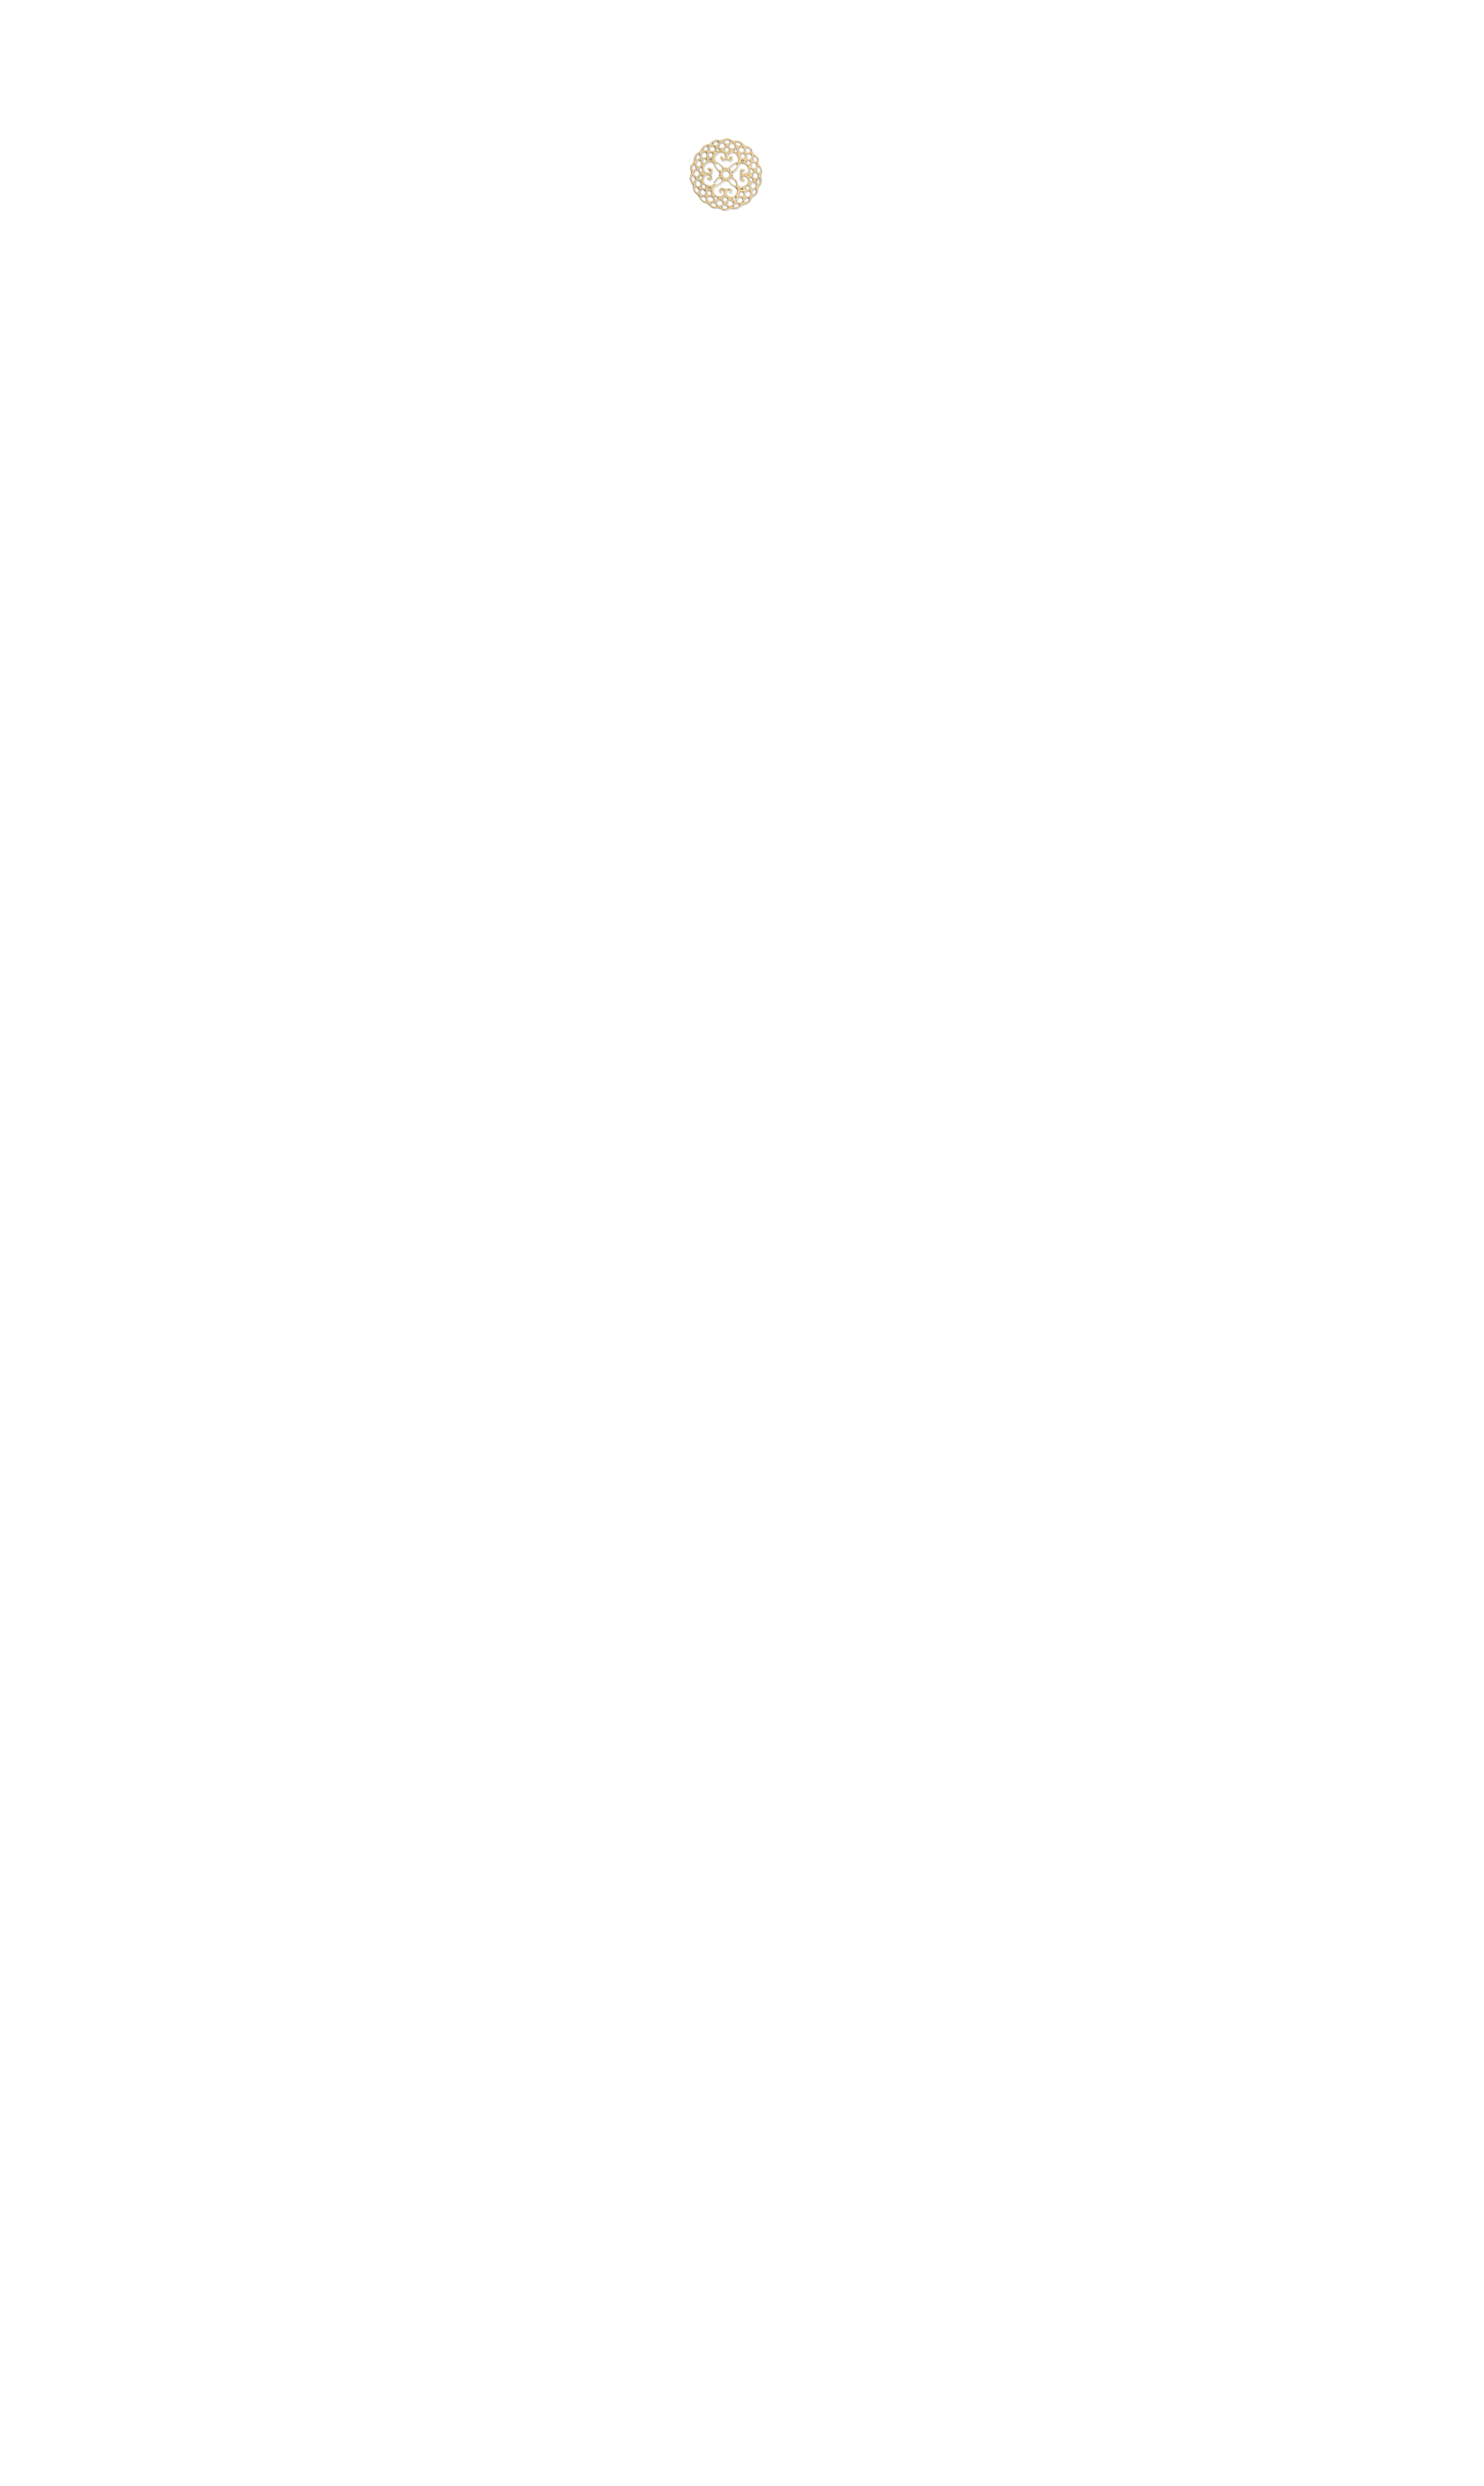 mini estampe ronde dorée